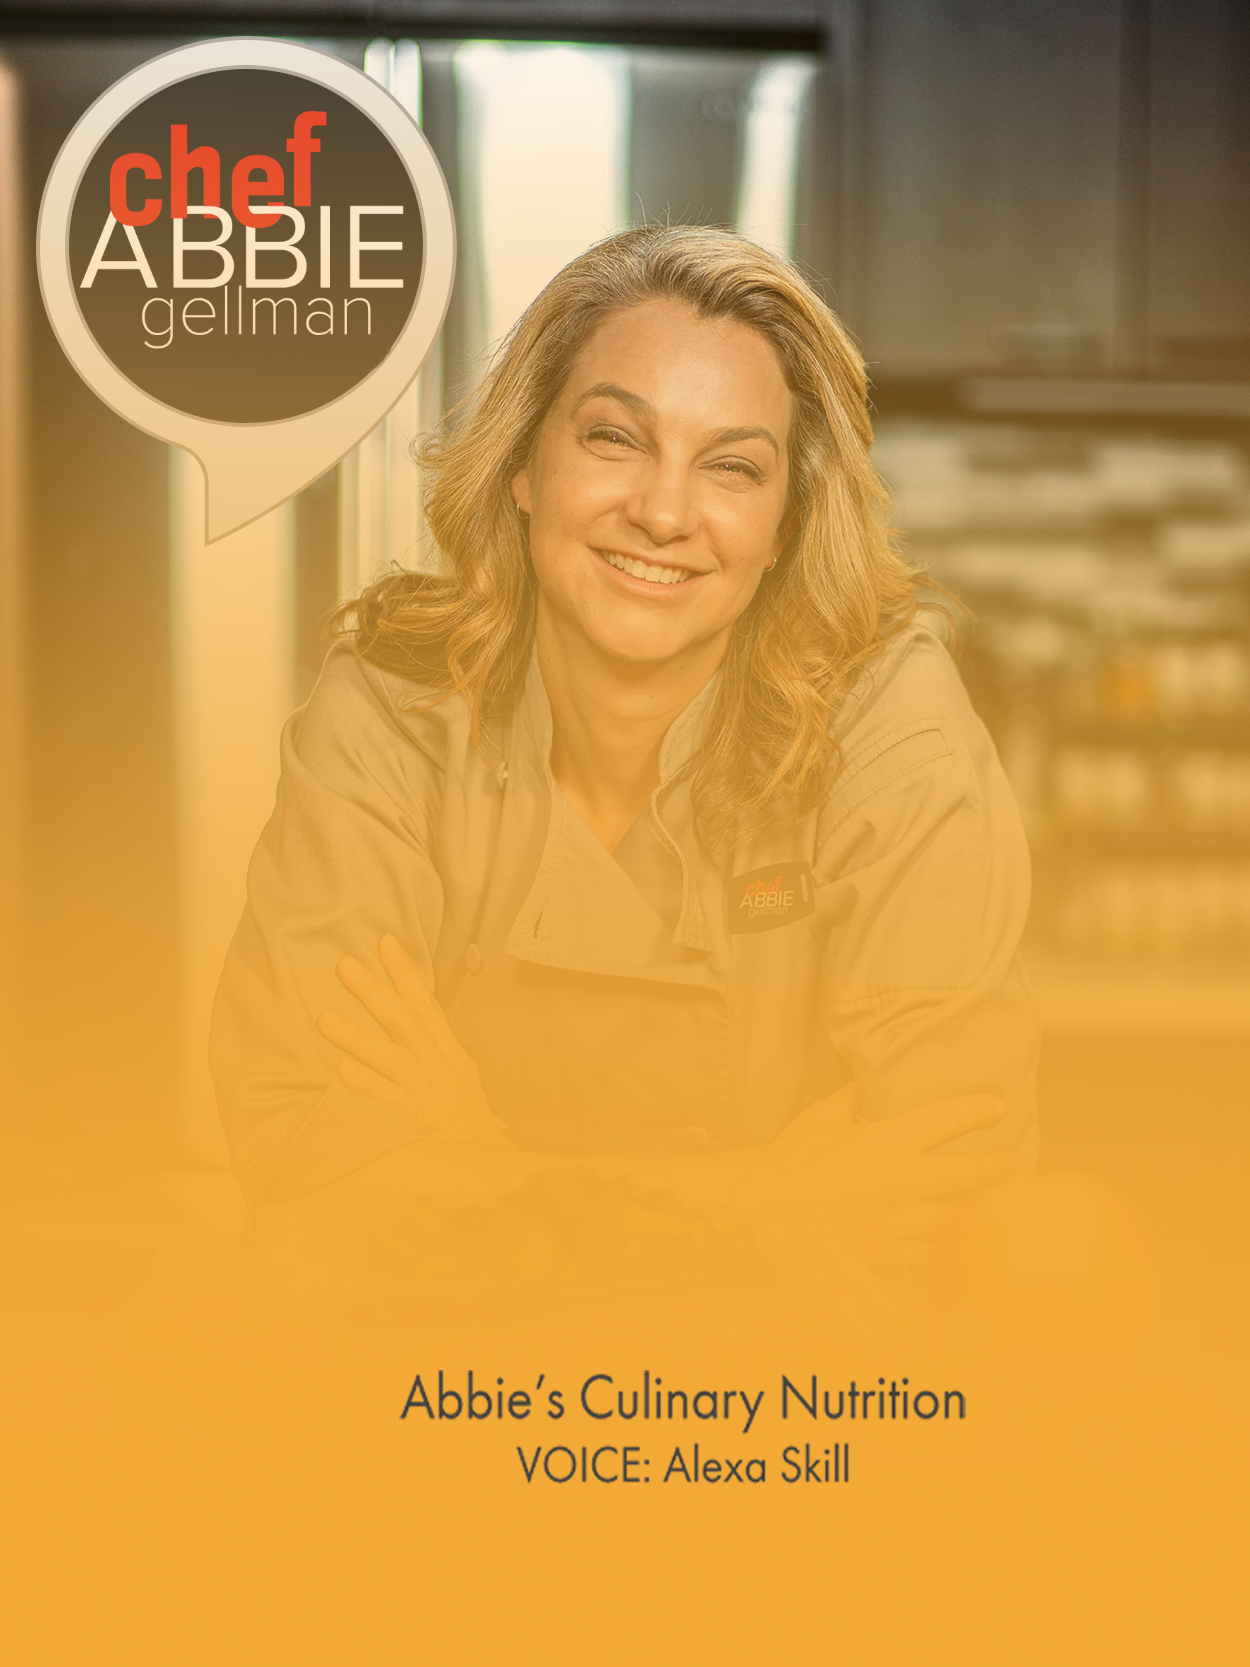 abbie's culinary nutrition alexa skill